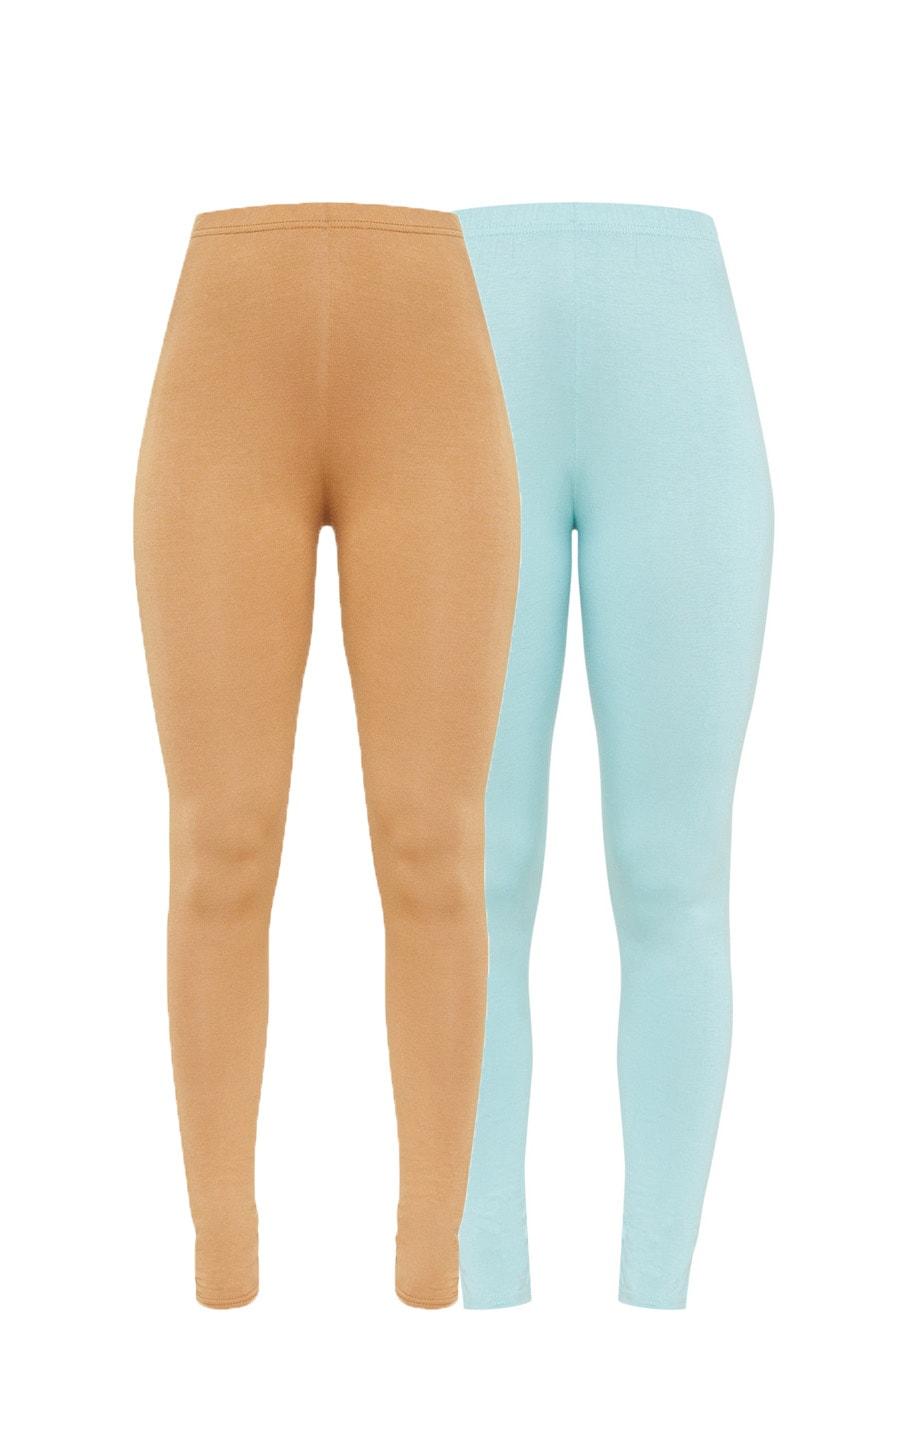 Camel and Sage Green Basic Jersey Leggings 2 Pack 3